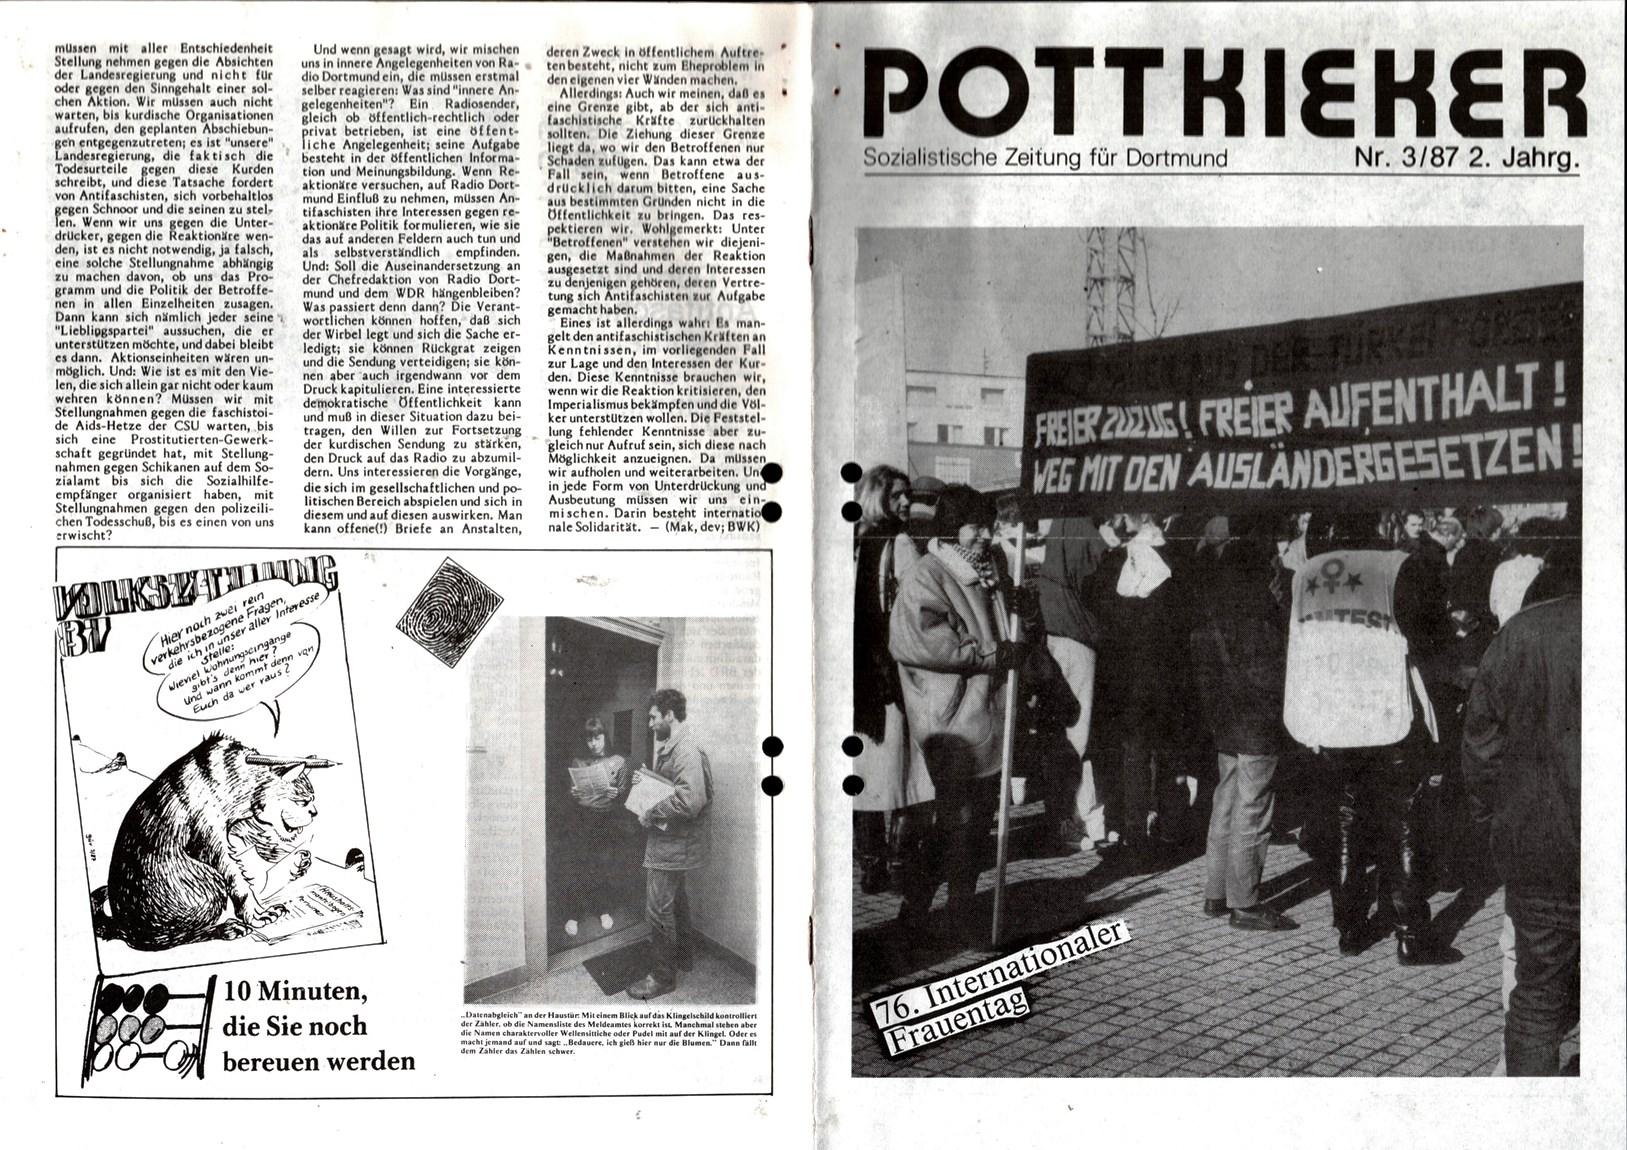 Dortmund_Pottkieker_19870300_01